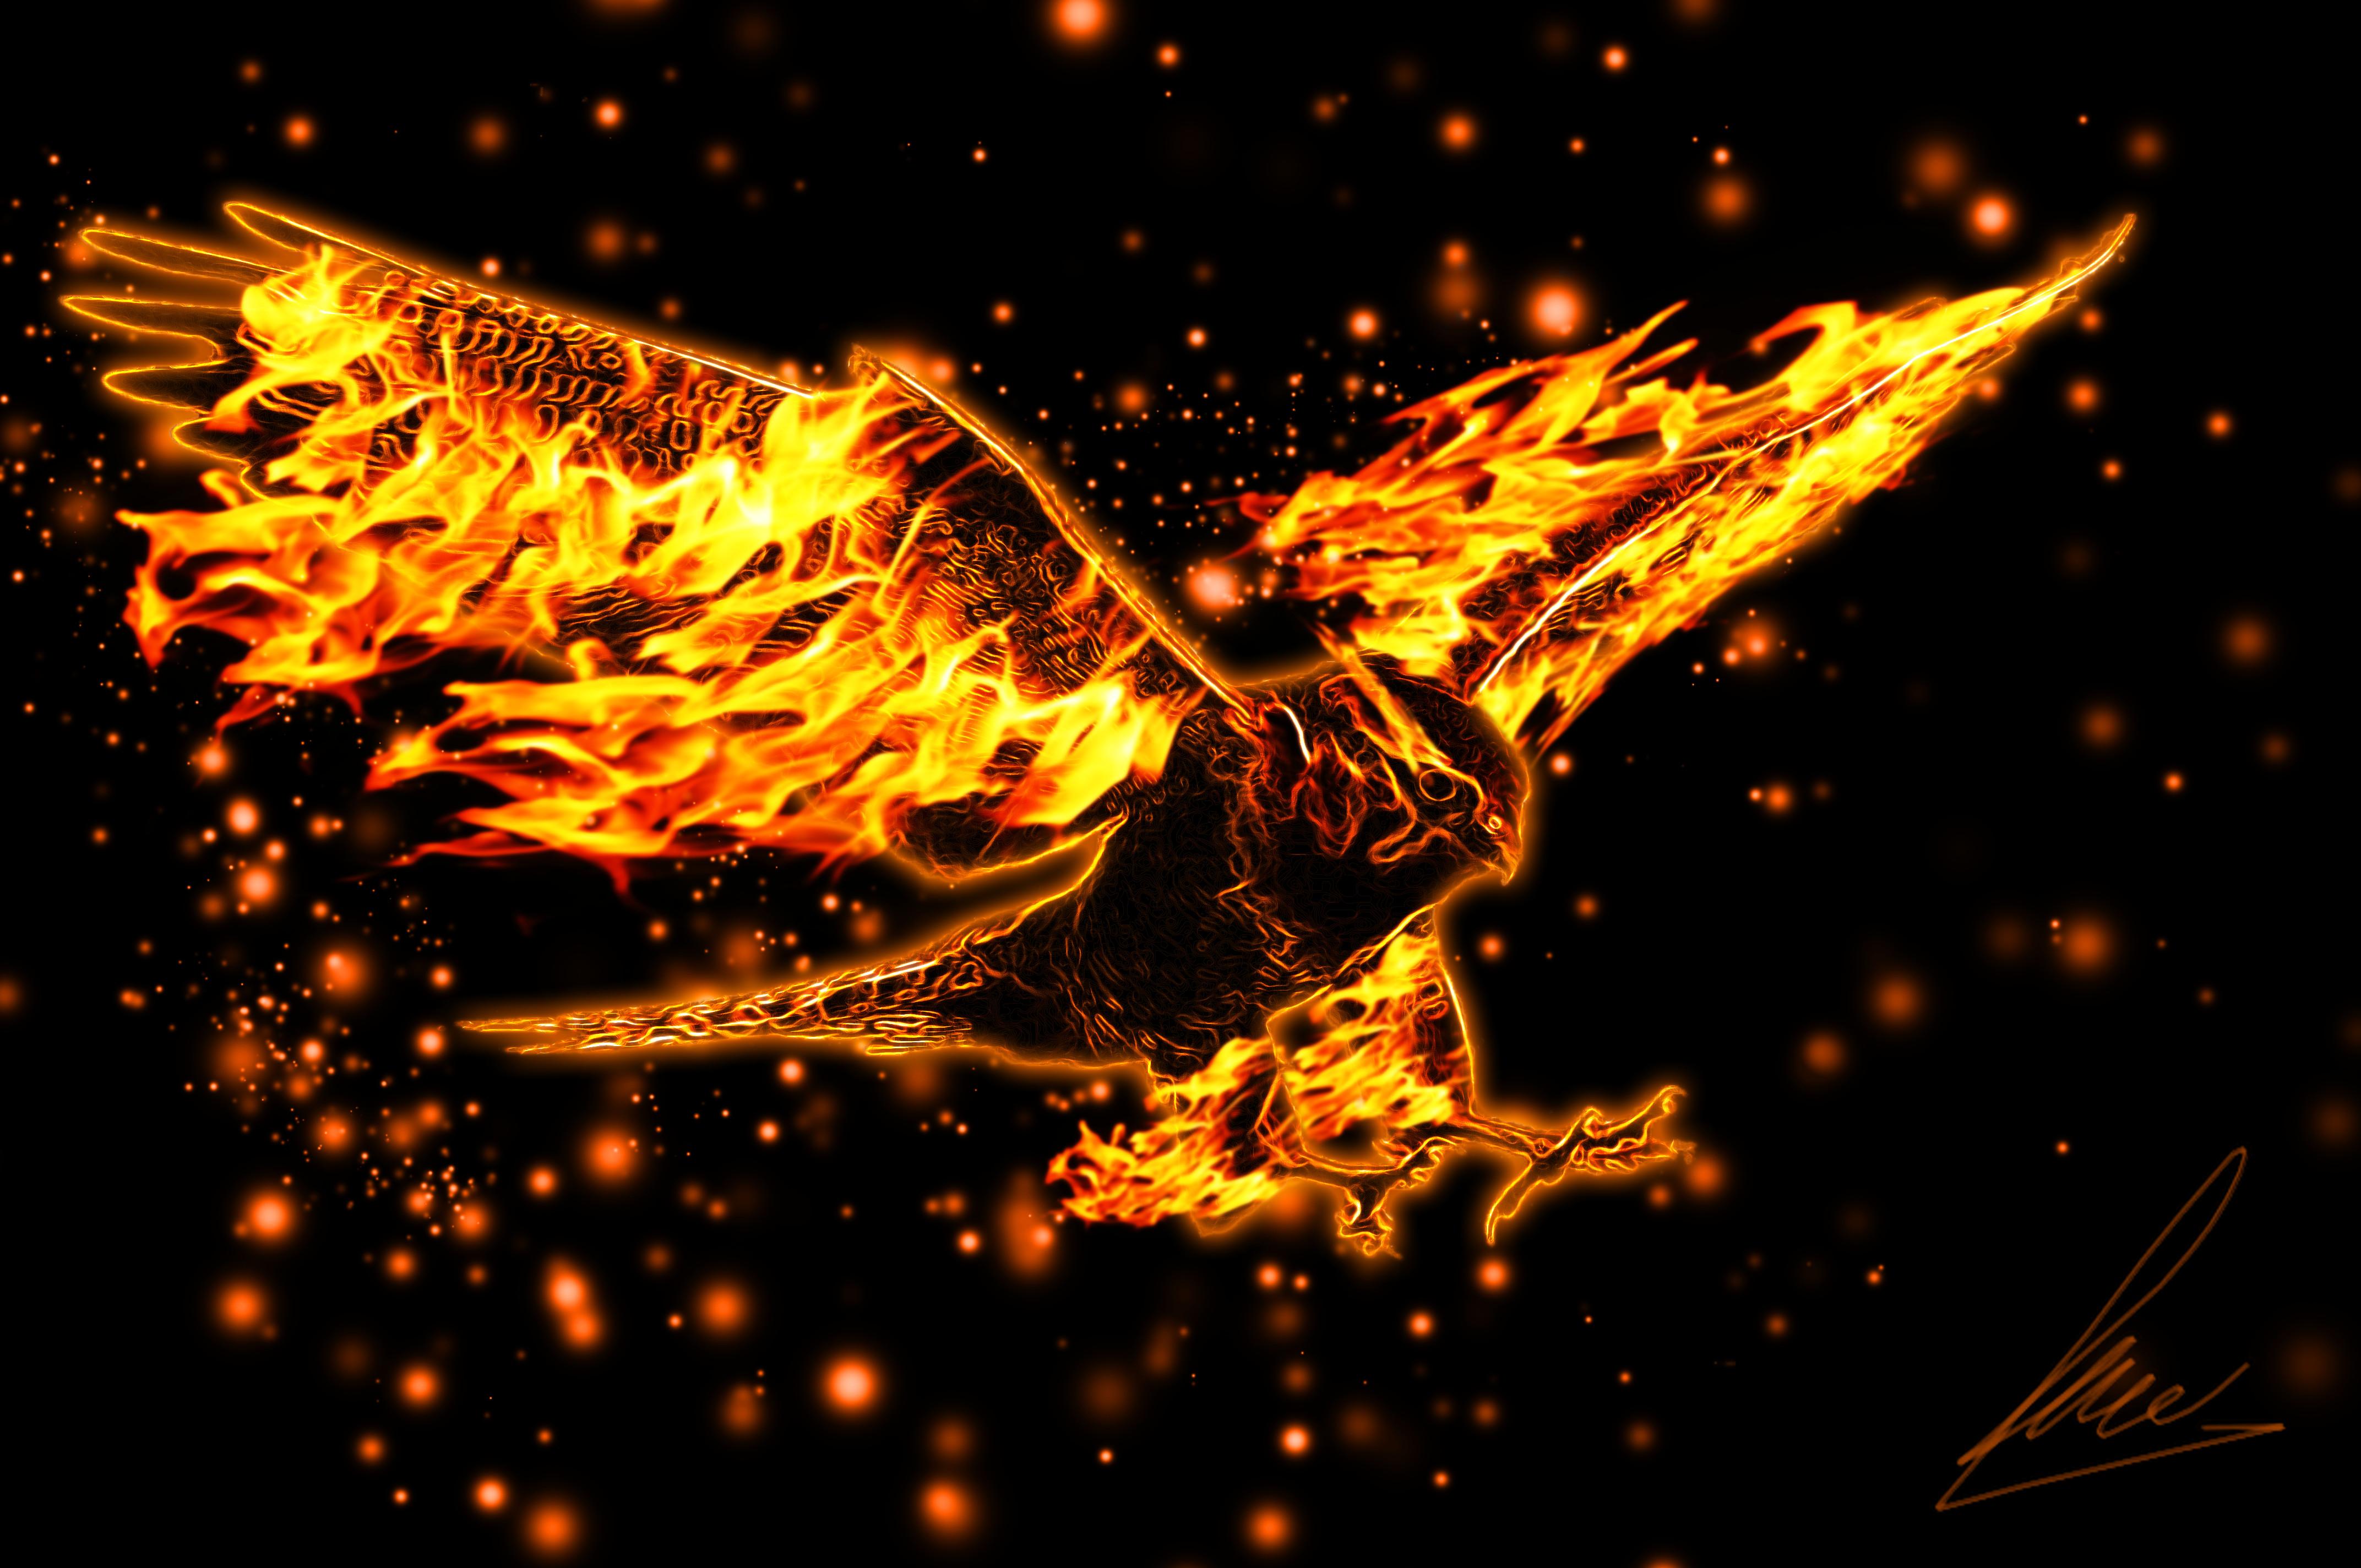 Fire Eagle 4k Ultra HD Wallpaper | Background Image ...